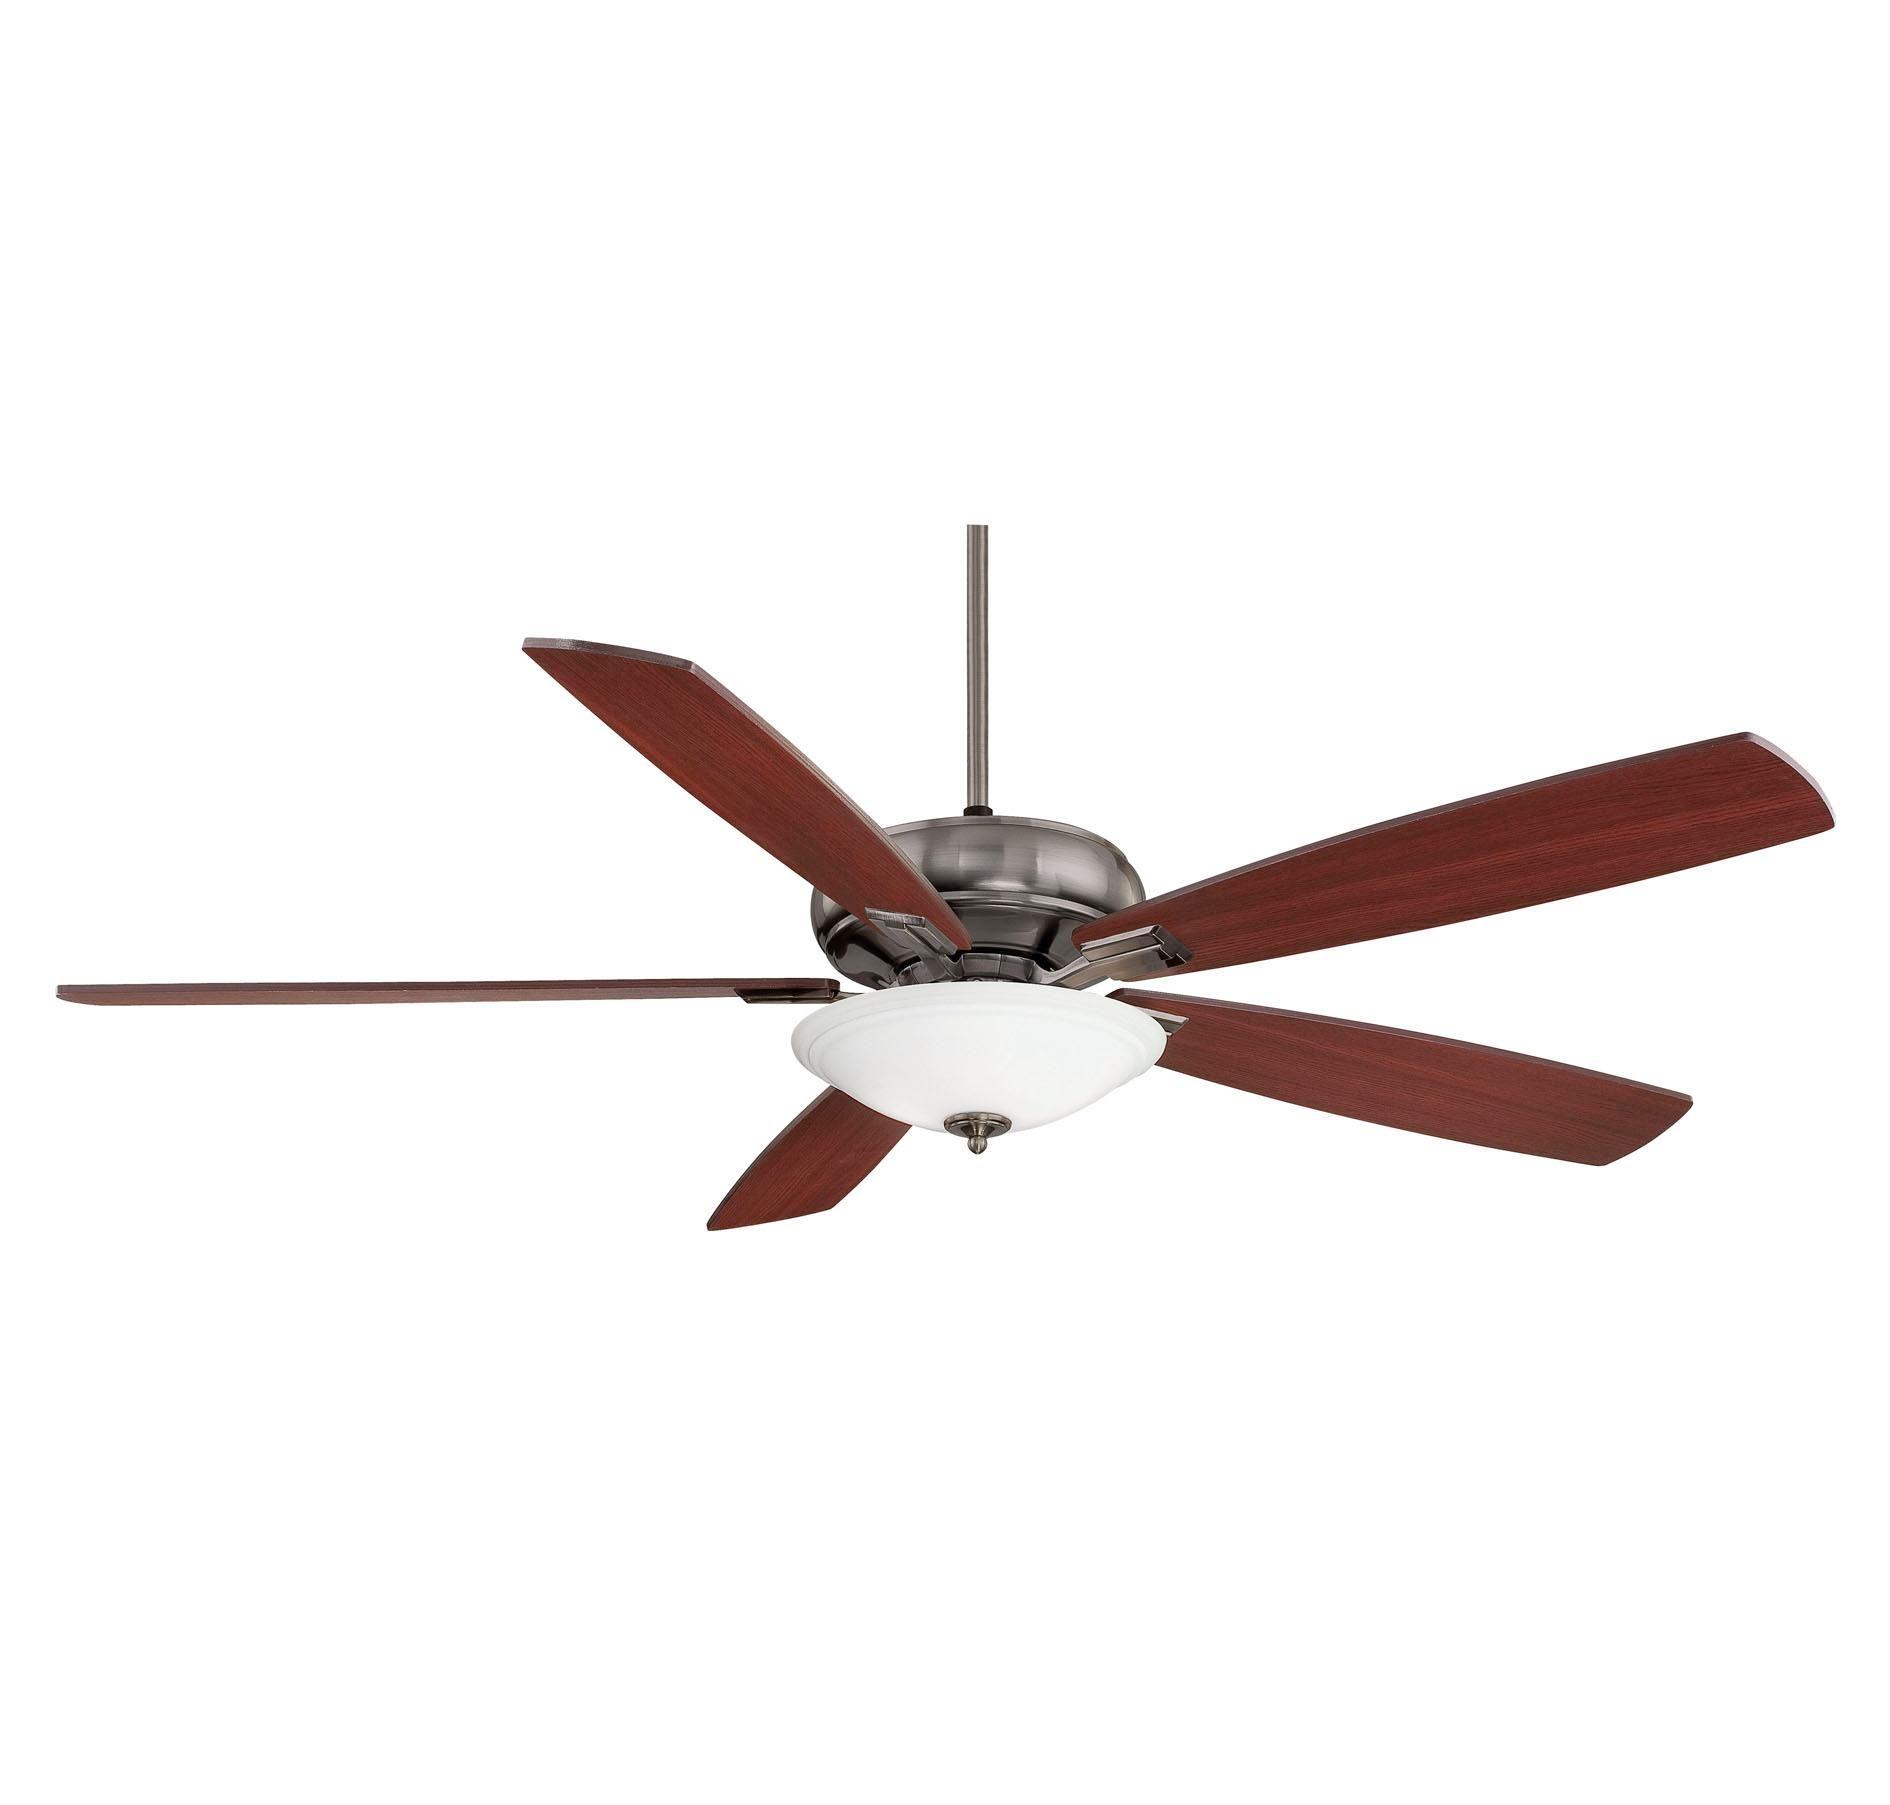 Fax 300 Ceiling Fan Ceiling Star Ceiling